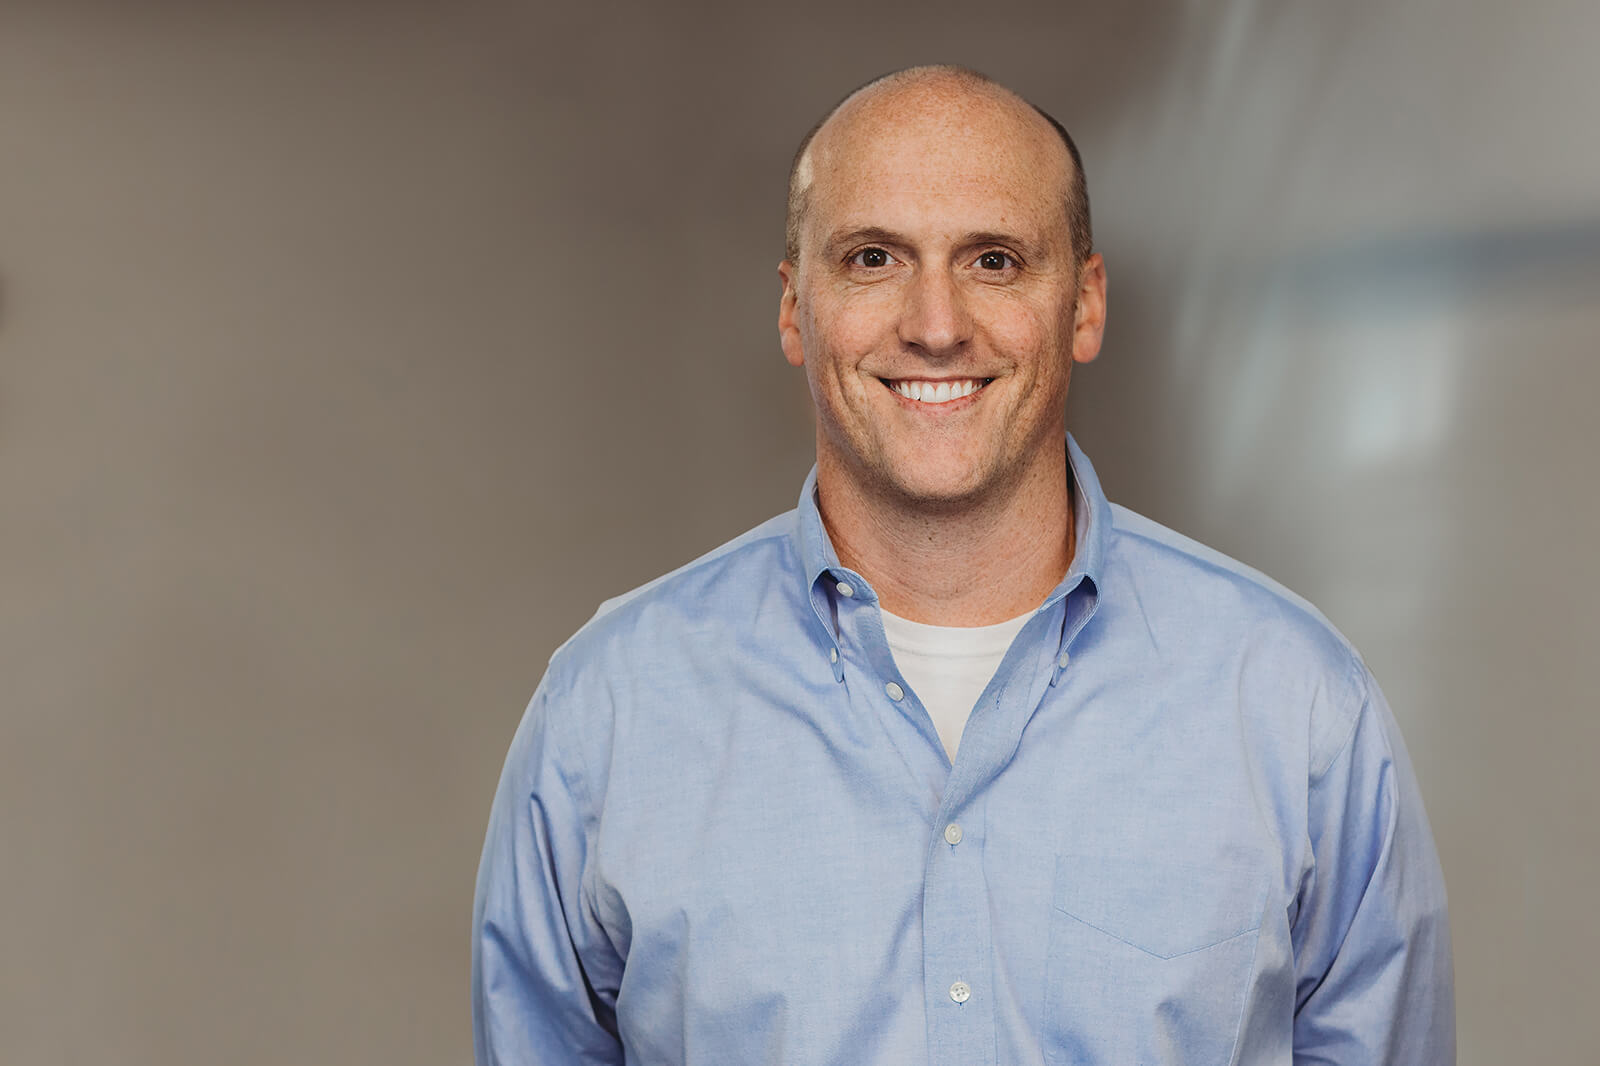 Steve Hardin Vice President of Employee Benefits